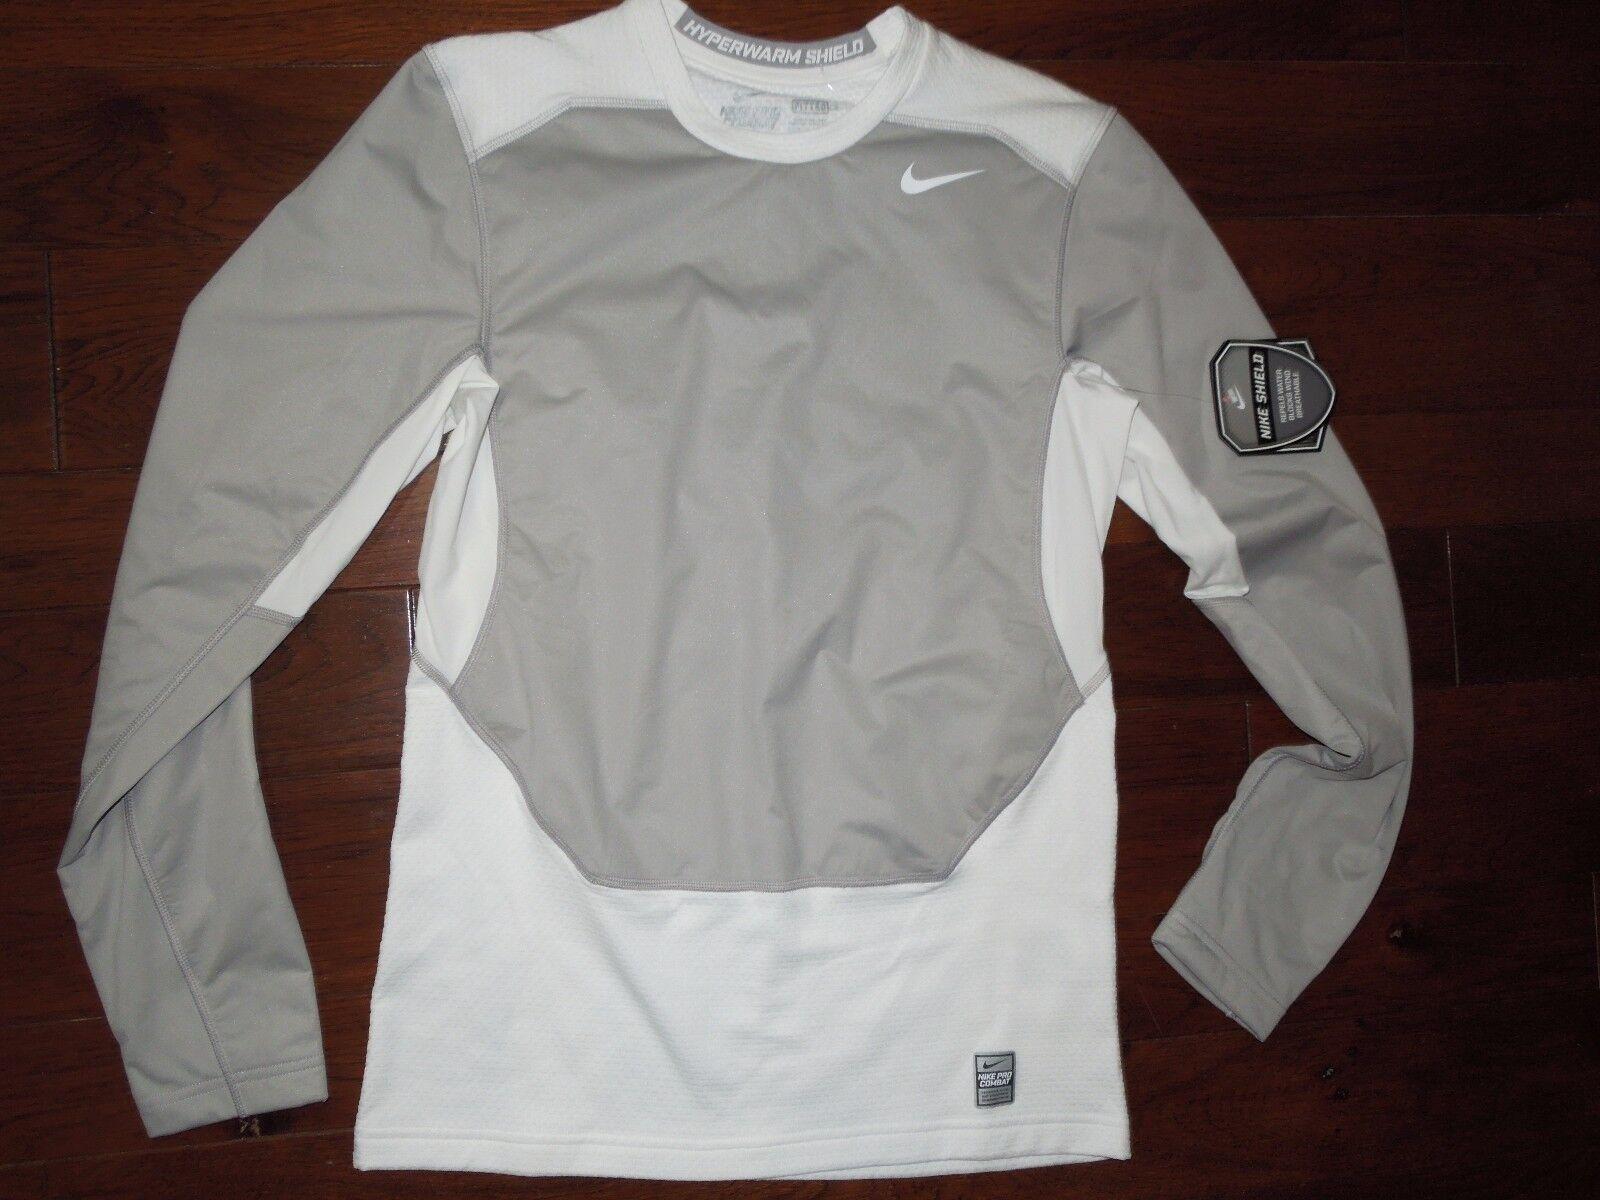 Pigmento salida Babosa de mar  Nike Pro Combat Max Hyperwarm Dri-fit Max Shield Shirt size SMALL retail  $80 for sale online